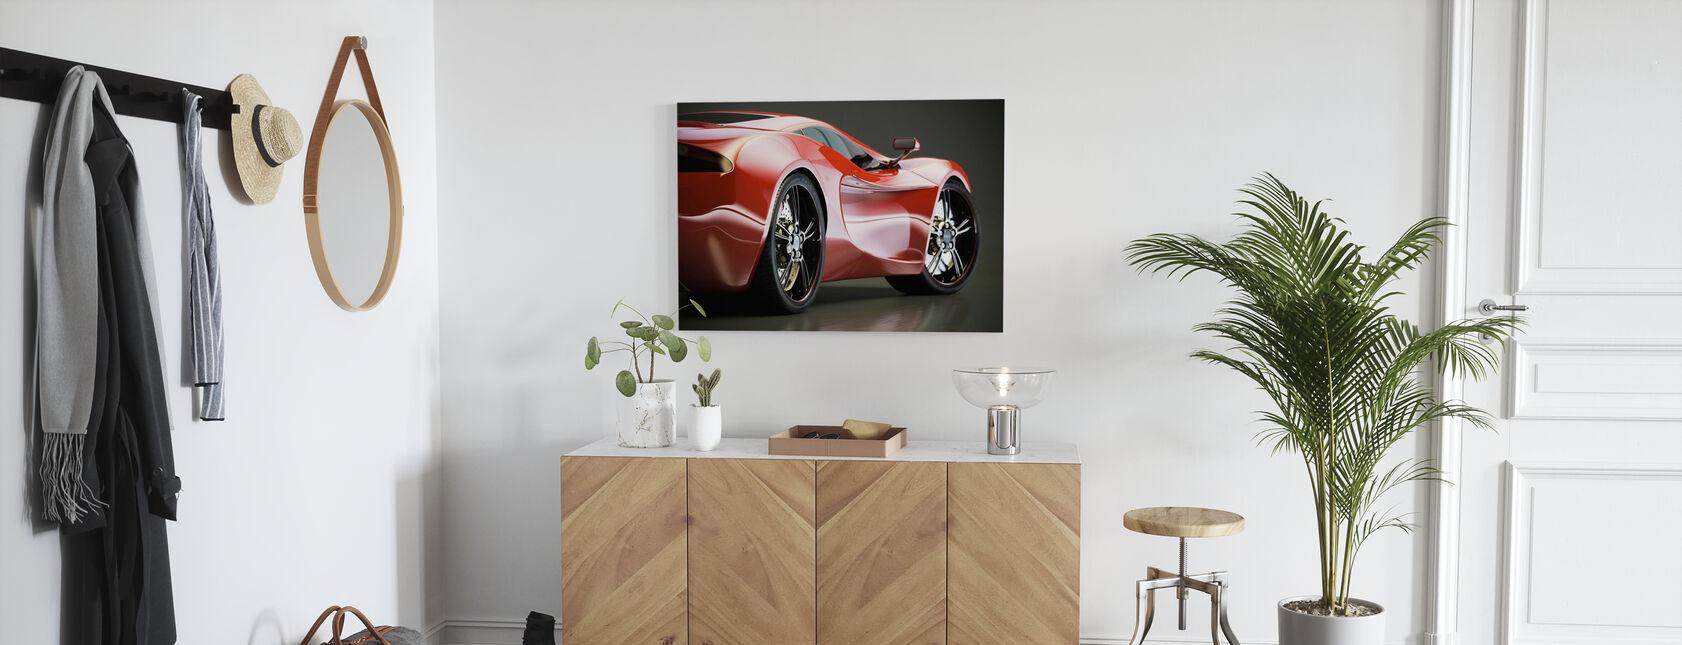 Sports Car - Canvas print - Hallway